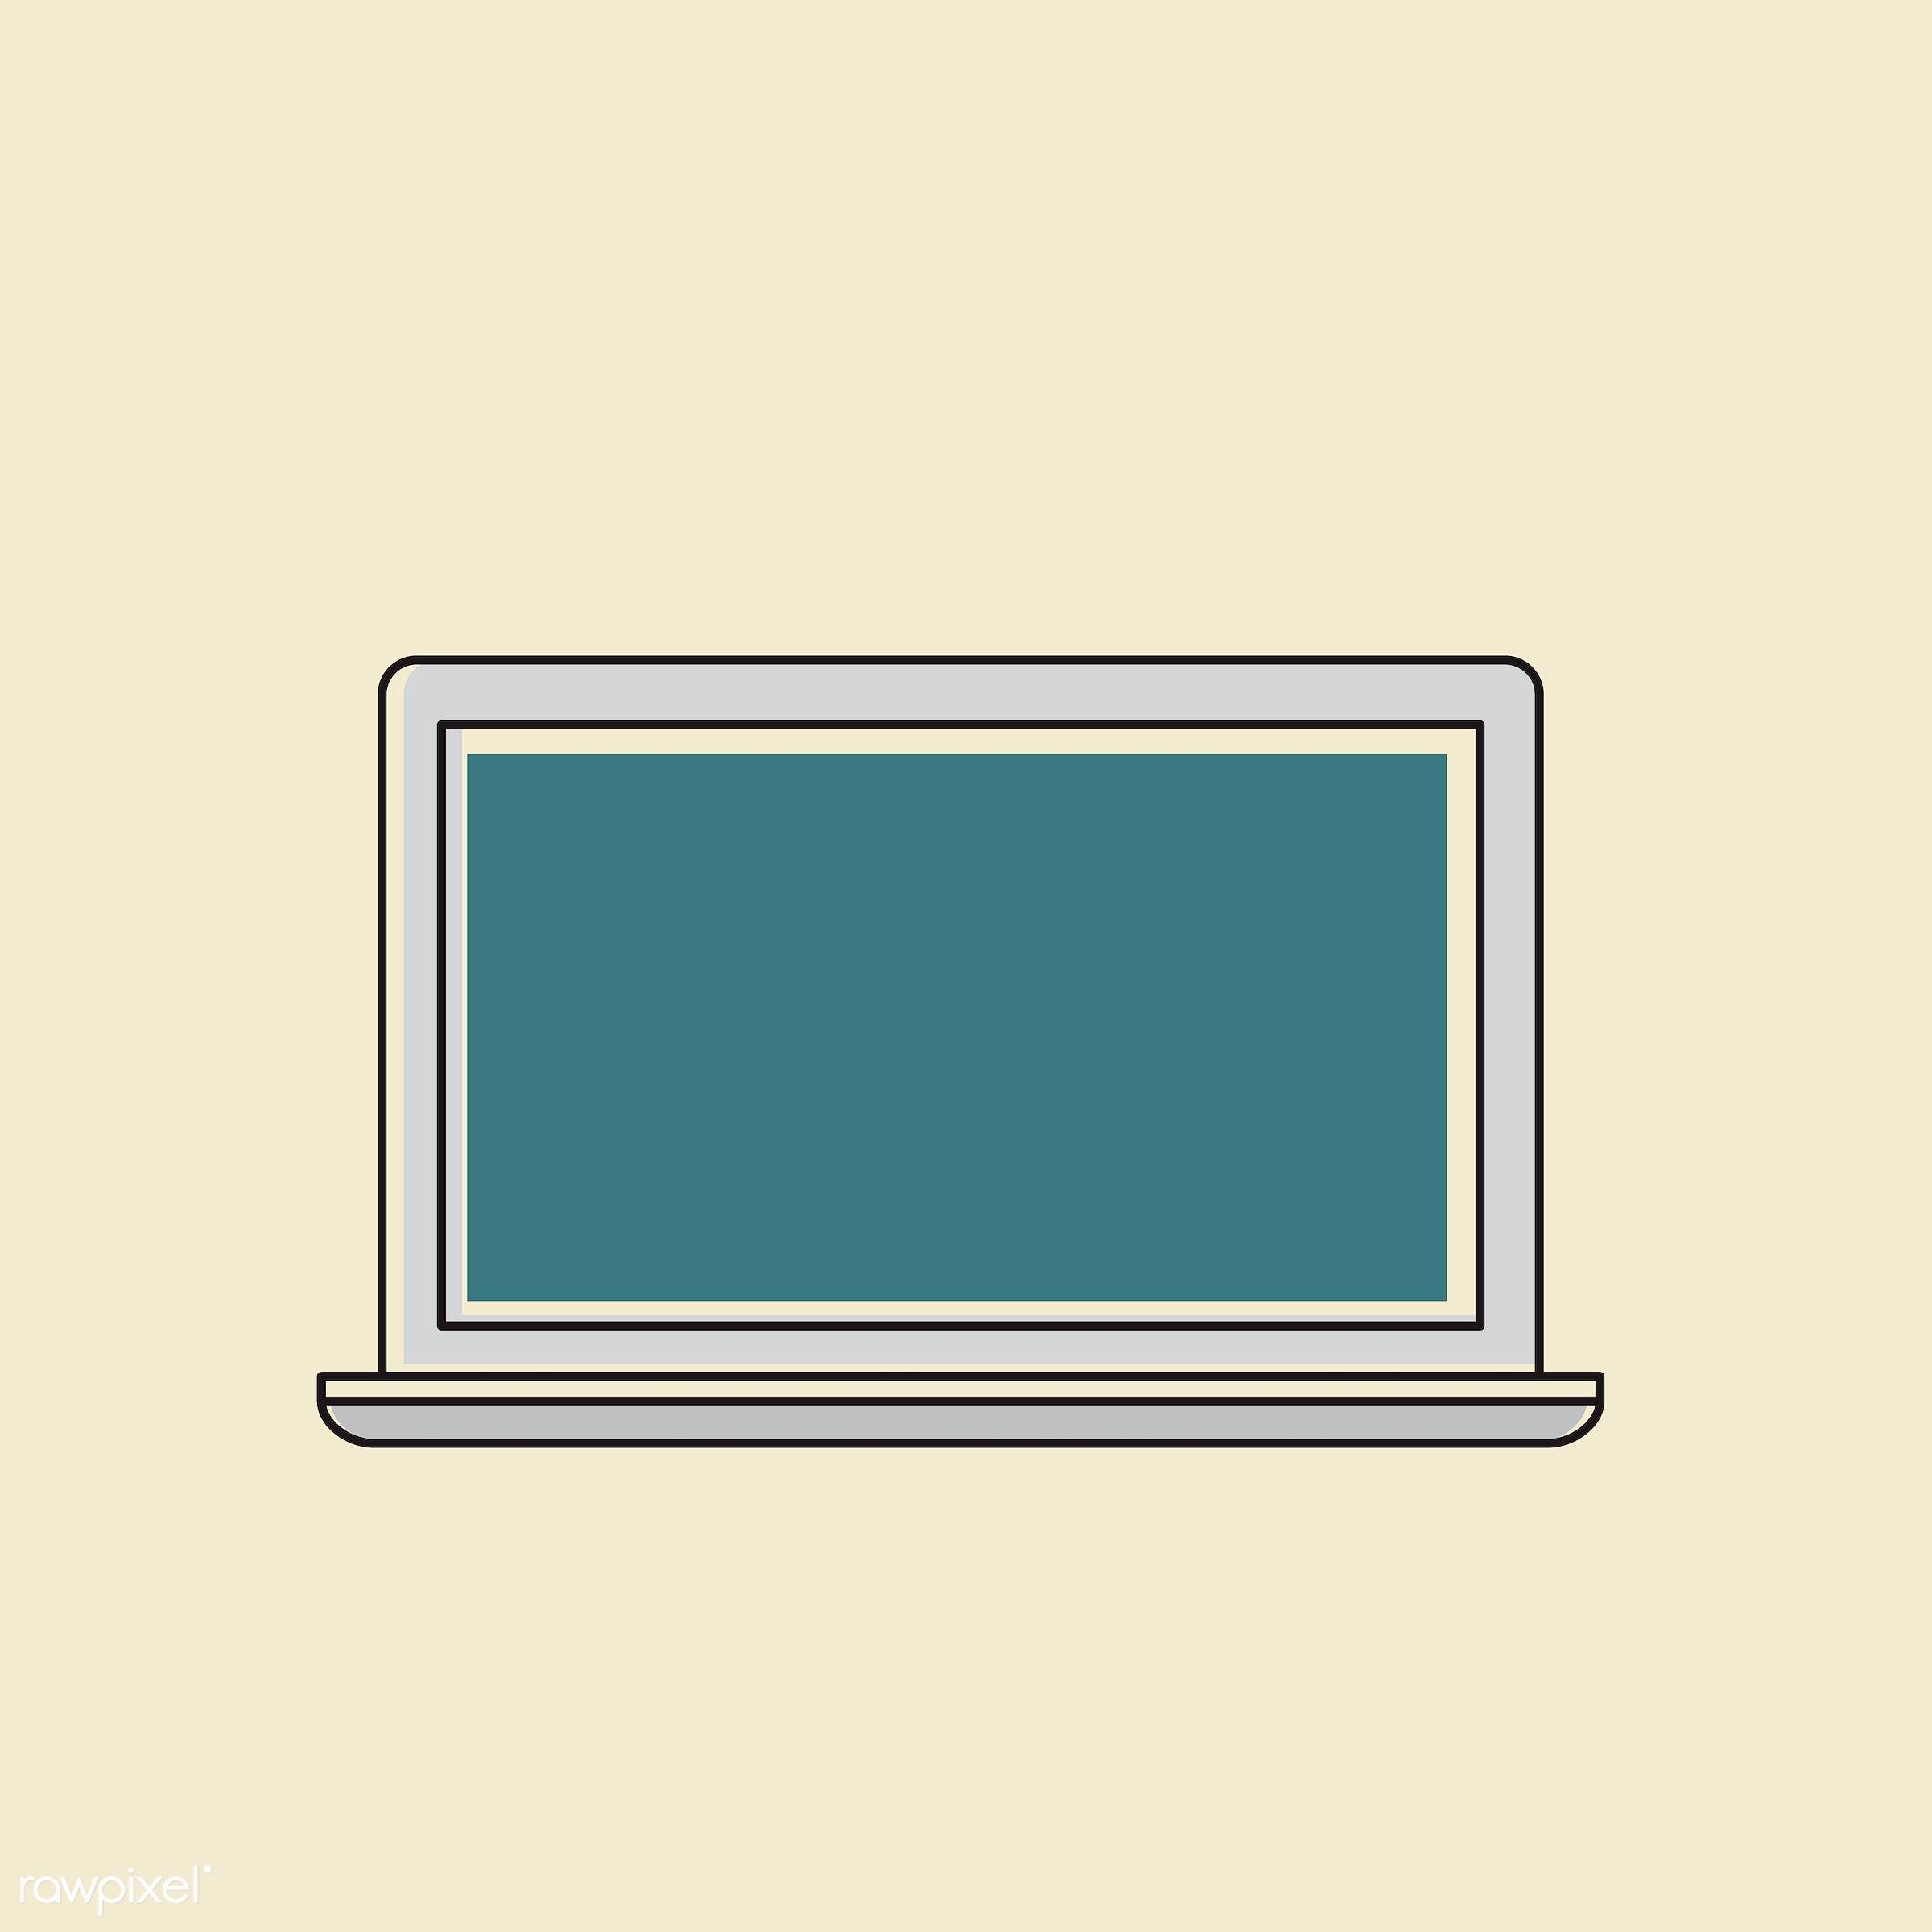 Vector of computer digital device - computer, design, digital, equipment, graphic, icon, illustration, laptop, monitor,...